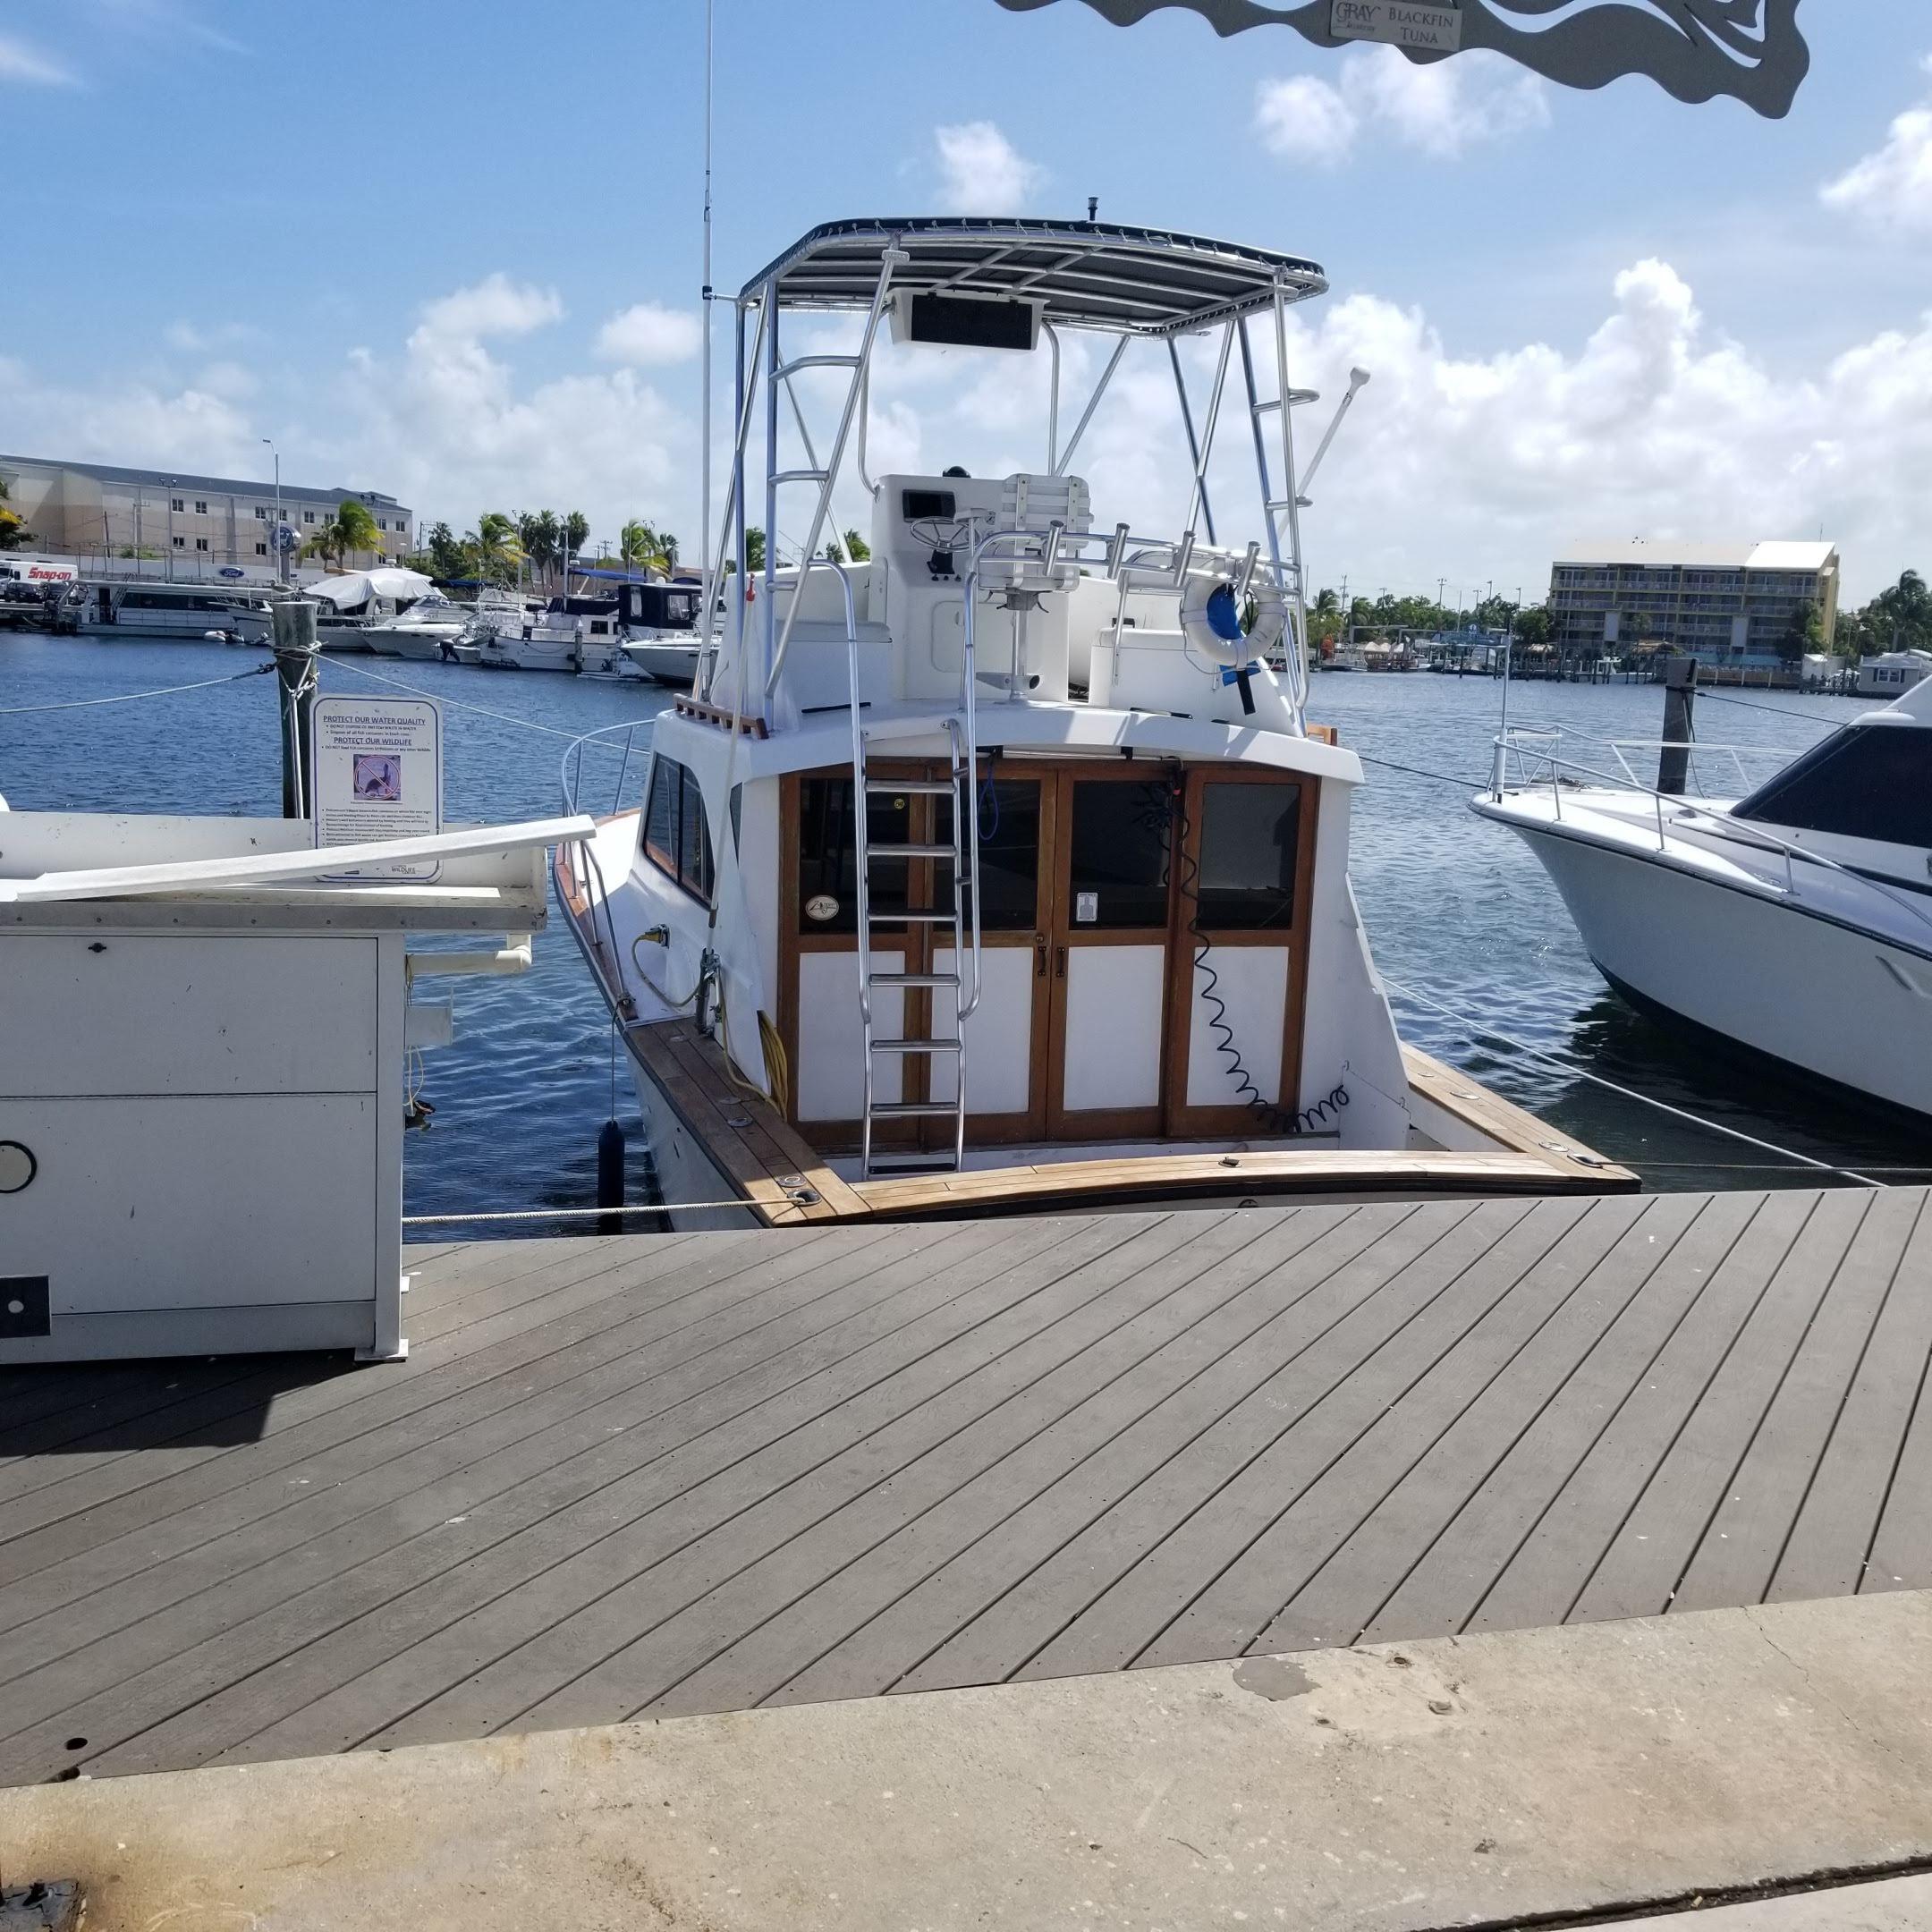 screaming lines fishing charter key west boat stern dock.jpg